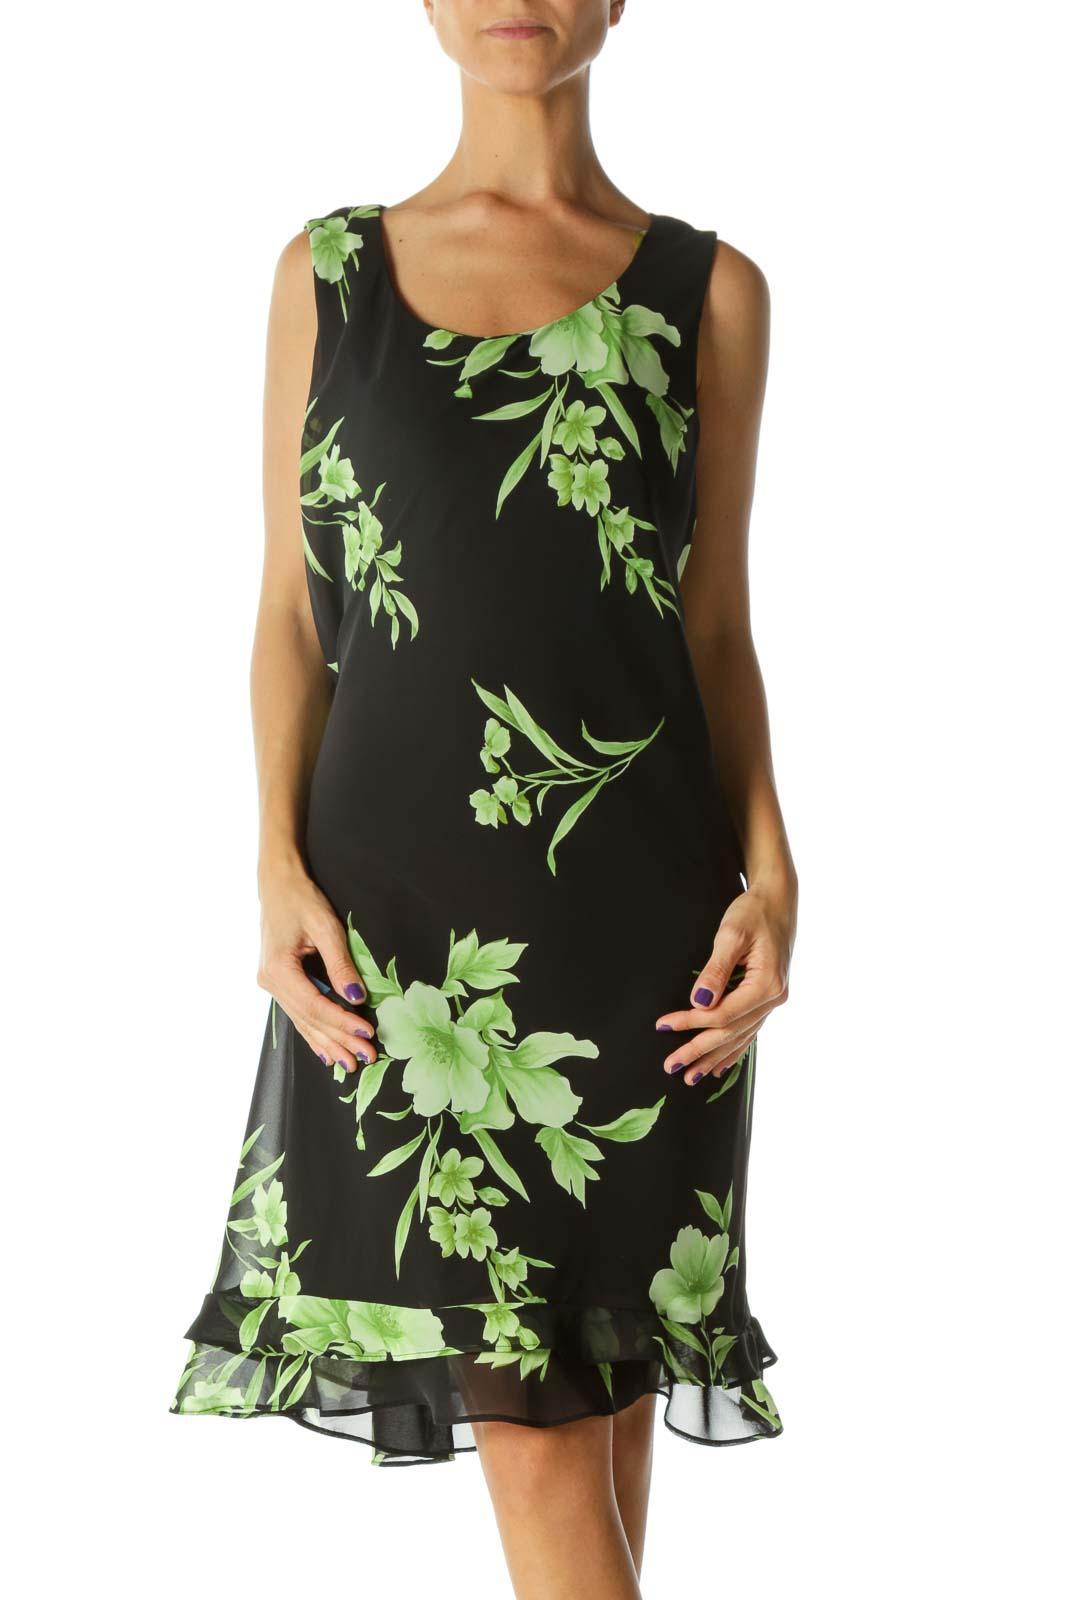 Black&Green Floral A-line Dress Front